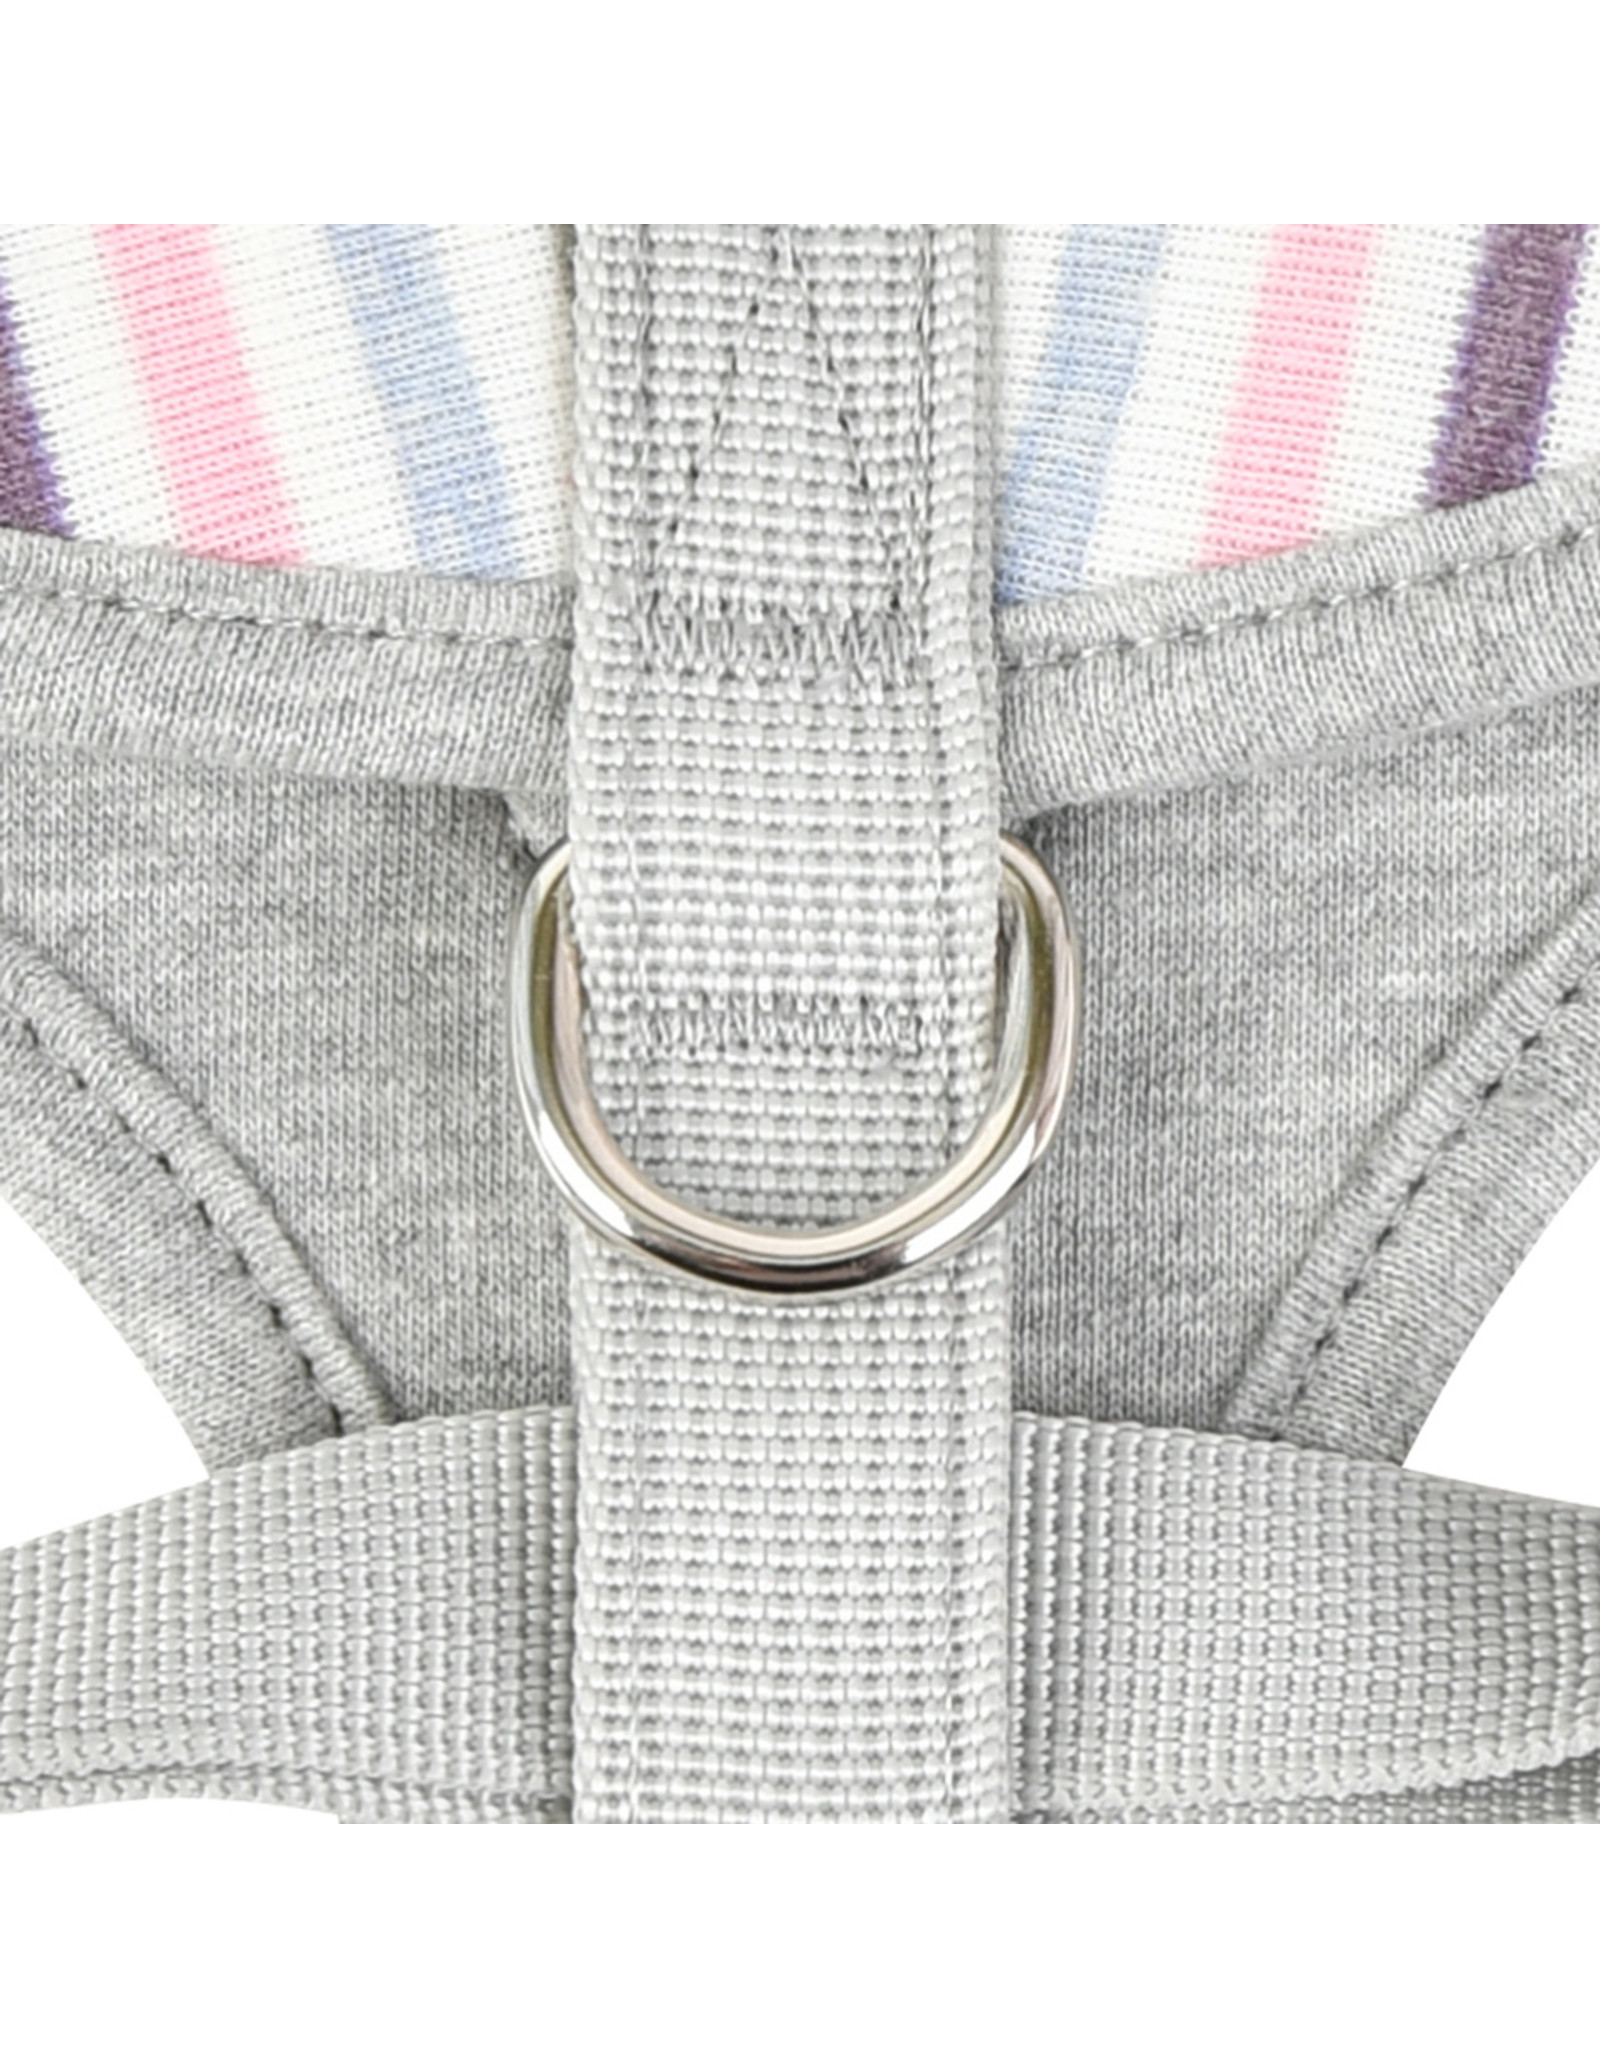 Pinkaholic Pinkaholic Effie harness Grey